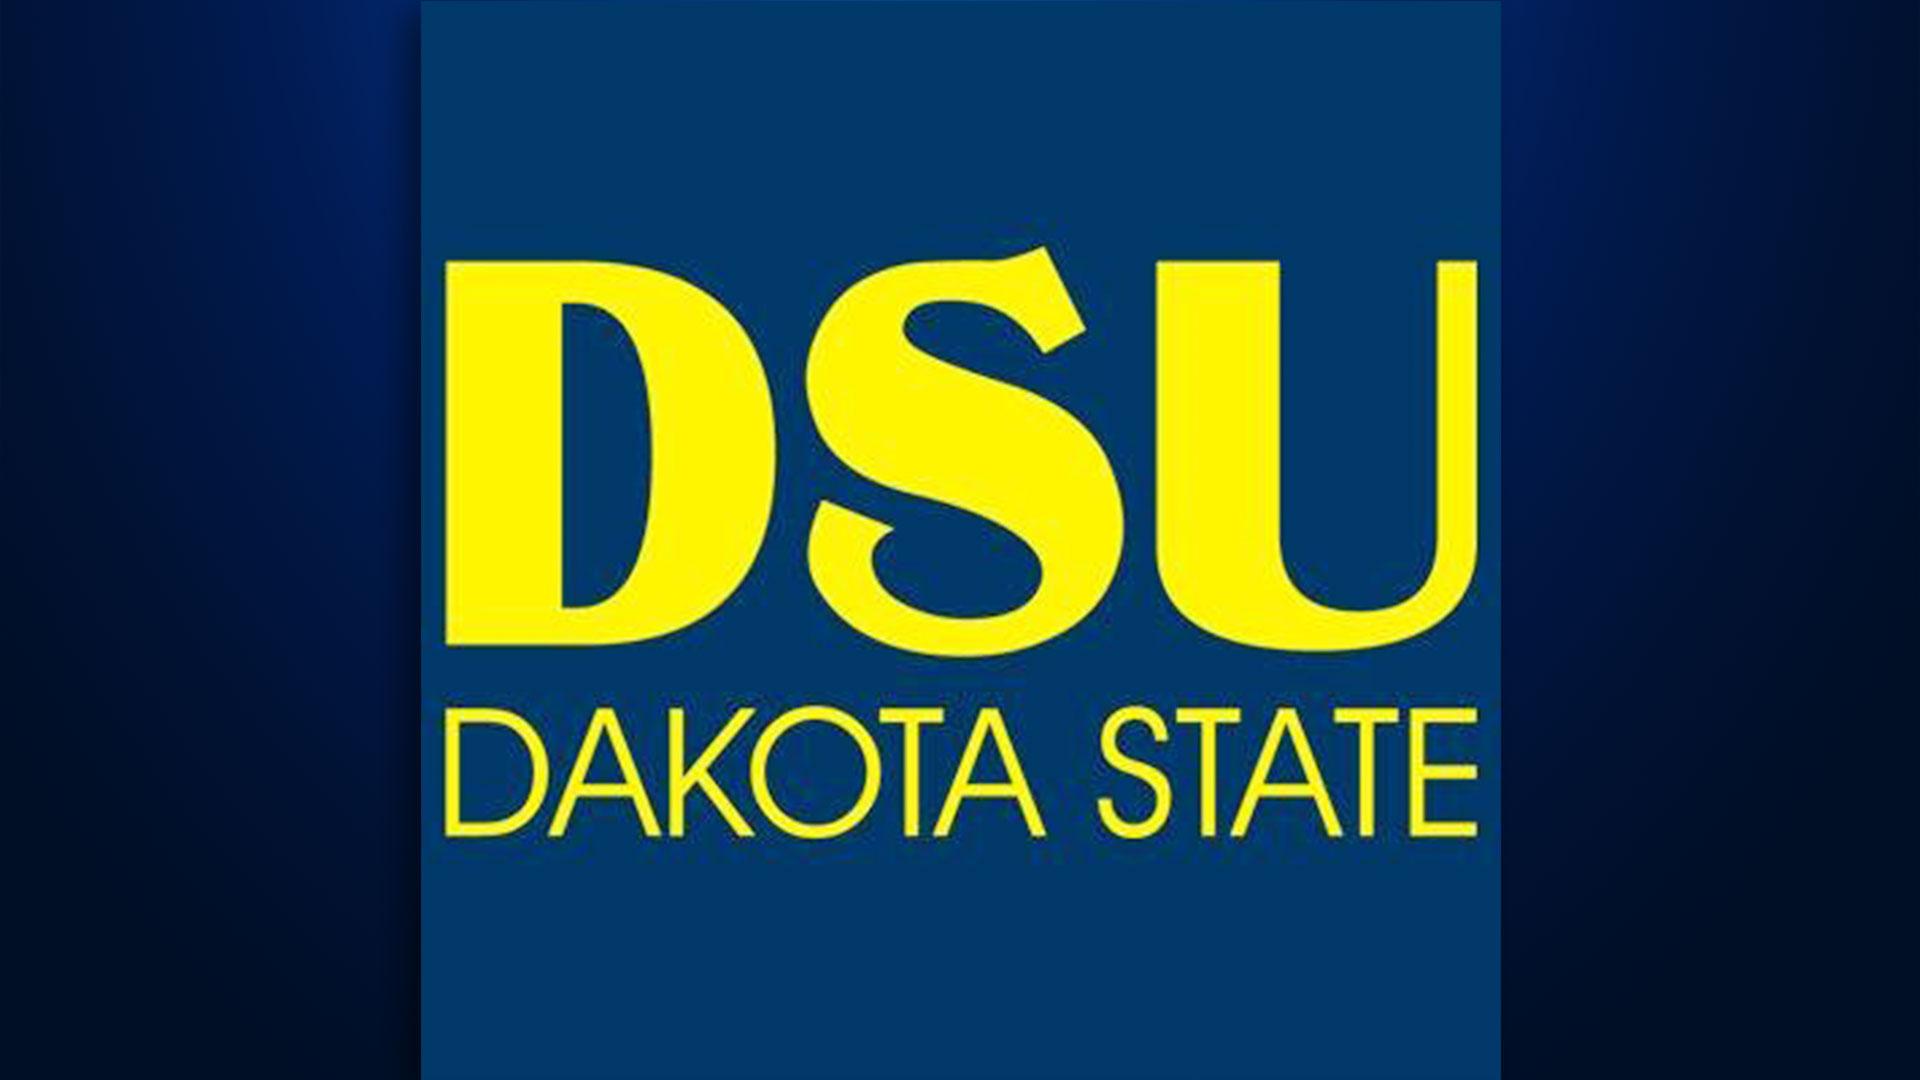 KELO Dakota State University Logo